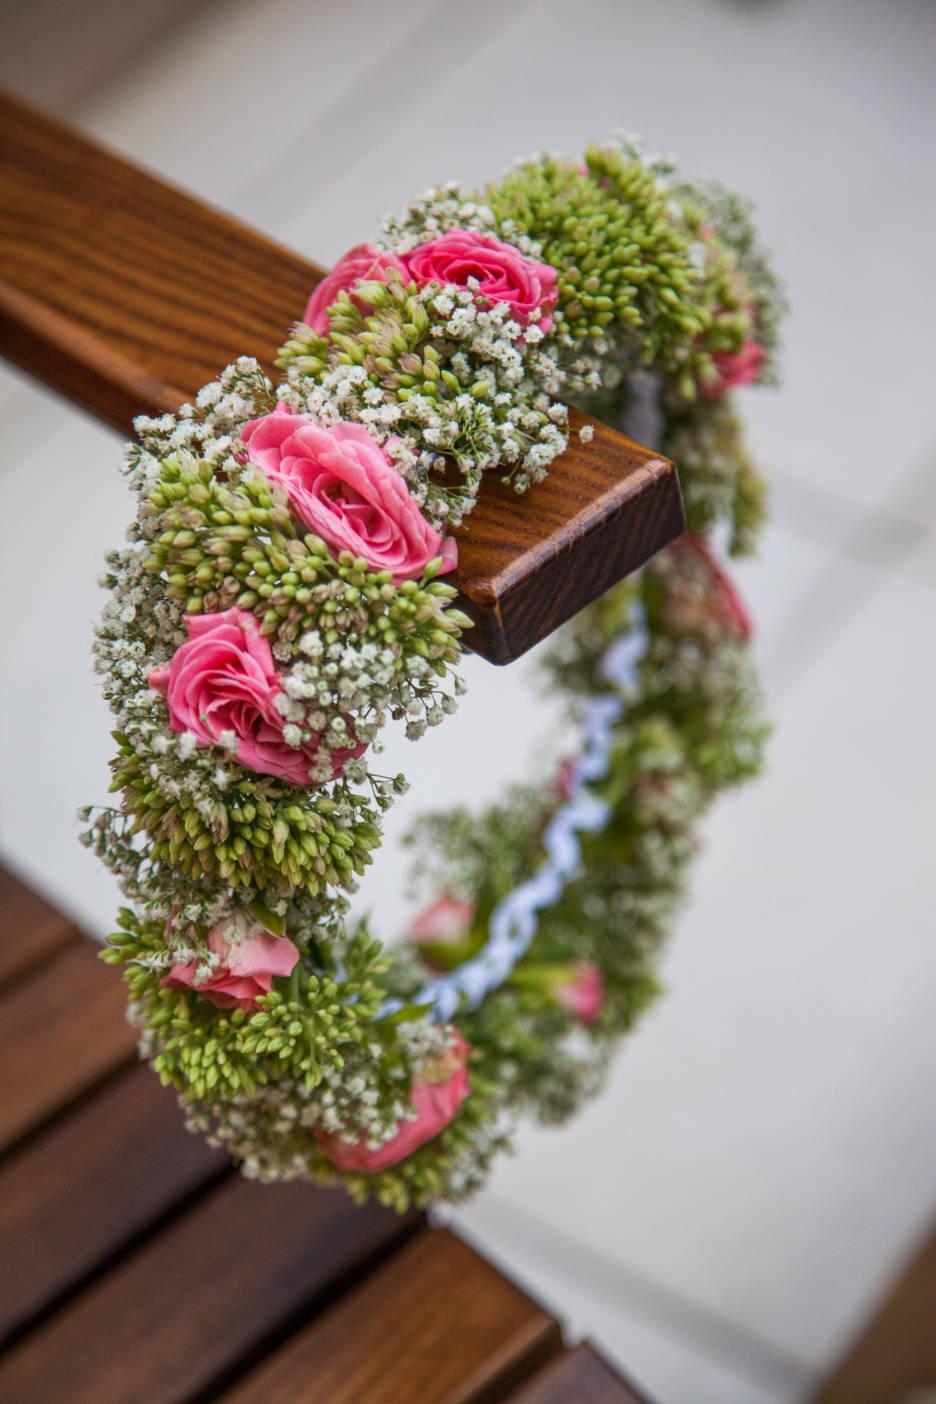 Poza, foto cu Flori de nunta coronita in Arad, Timisoara, Oradea (wedding flowers, bouquets) nunta Arad, Timisoara, Oradea